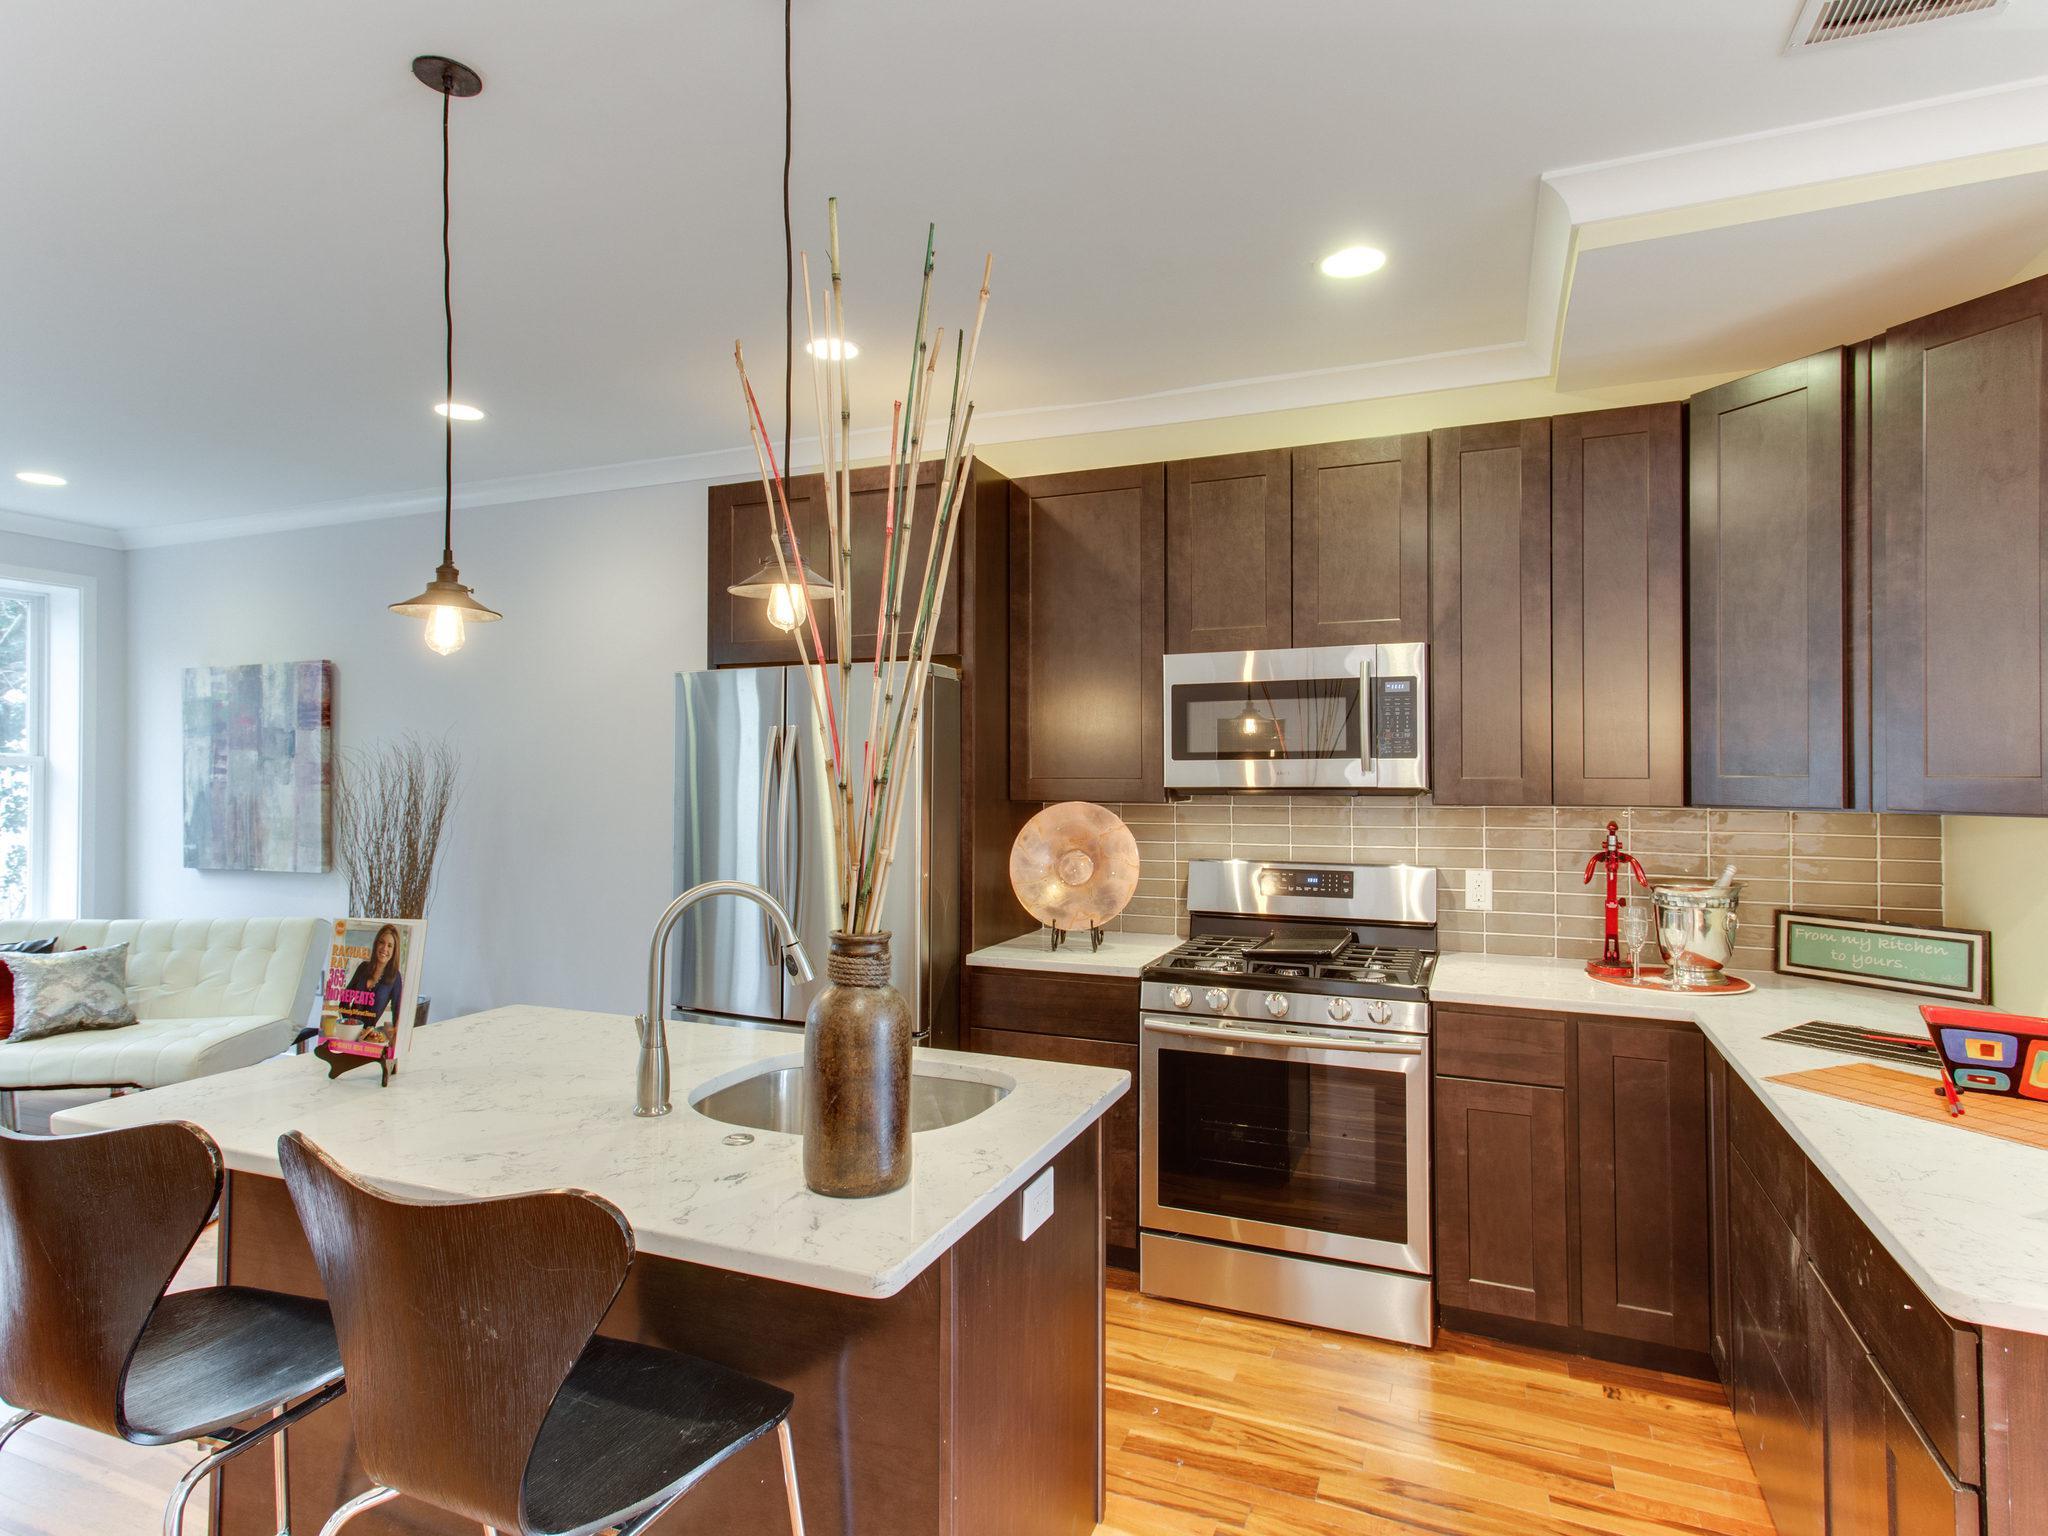 2807 Sherman Ave Unit B Kitchen.jpg